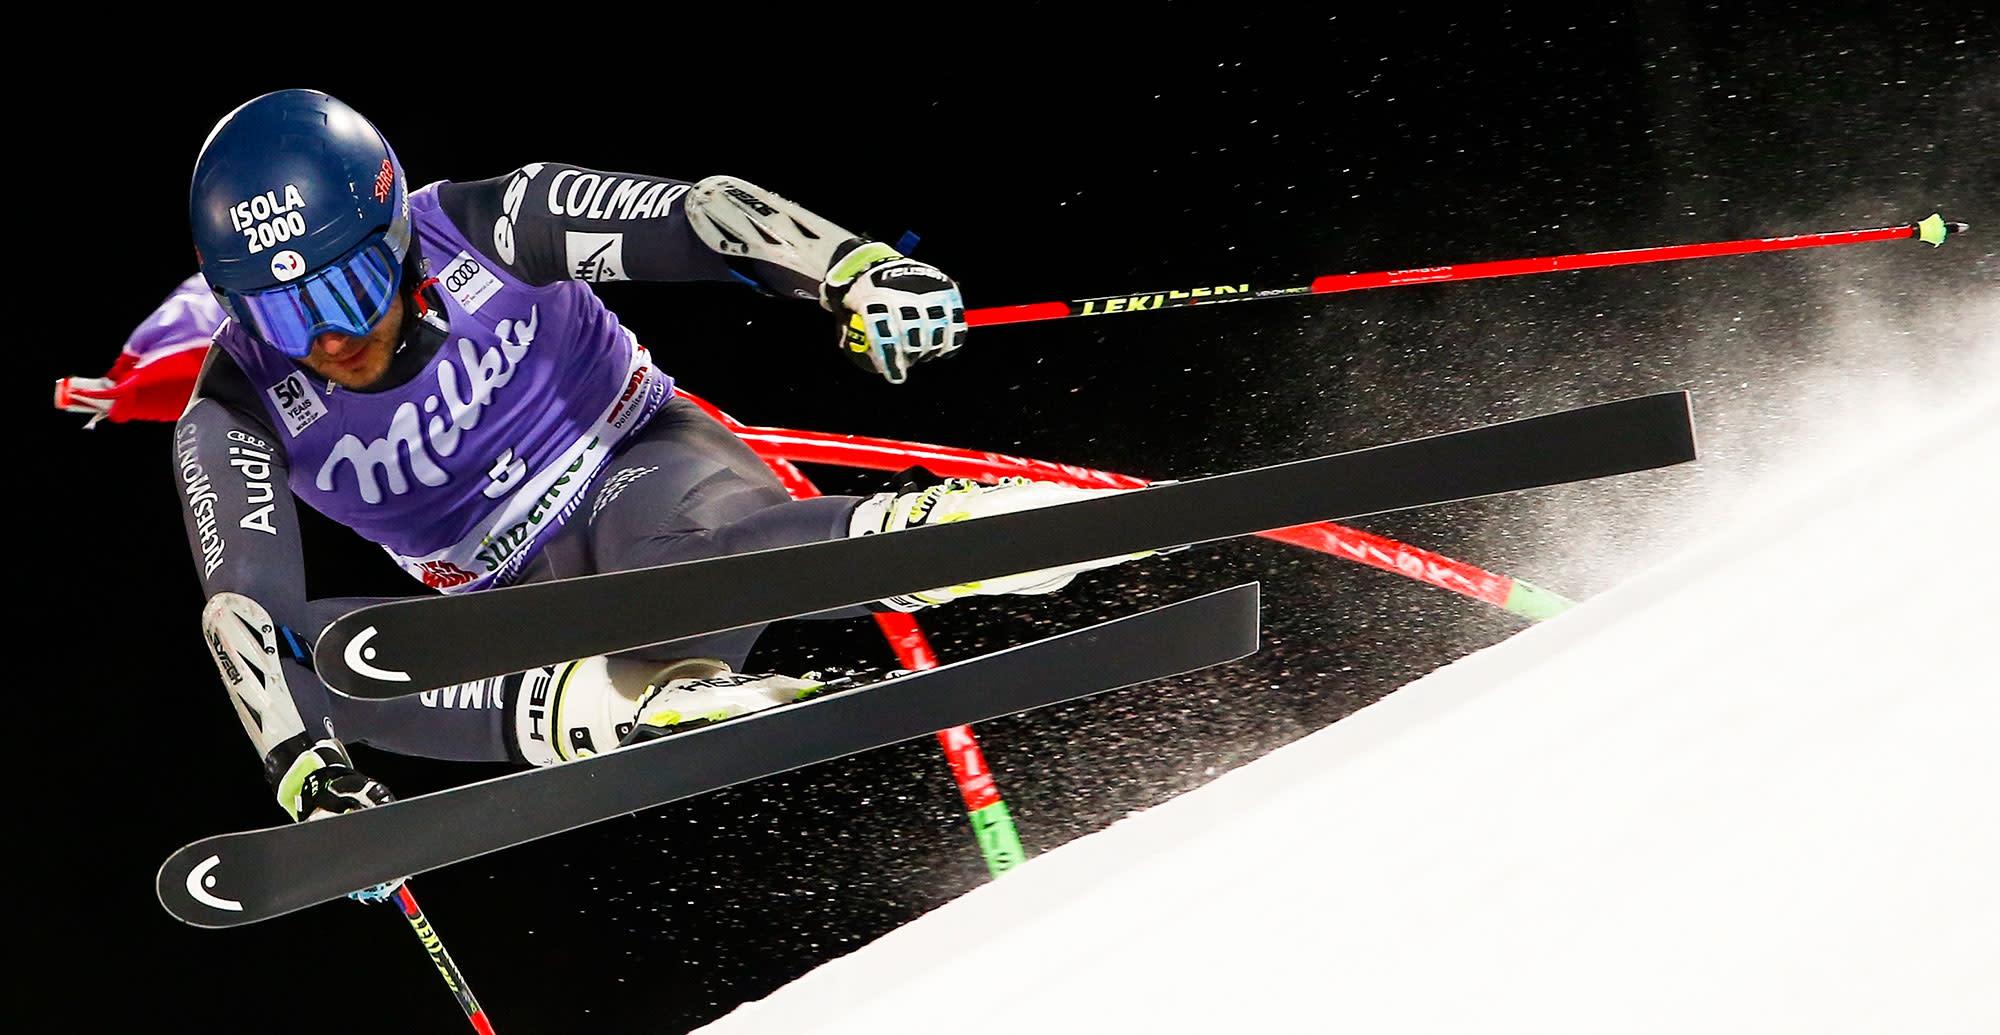 <p>France's Mathieu Faivre competes during an alpine ski, men's World Cup parallel giant slalom, in Alta Badia, Italy, Monday, Dec. 19, 2016. (Photo: Gabriele Facciotti/AP) </p>